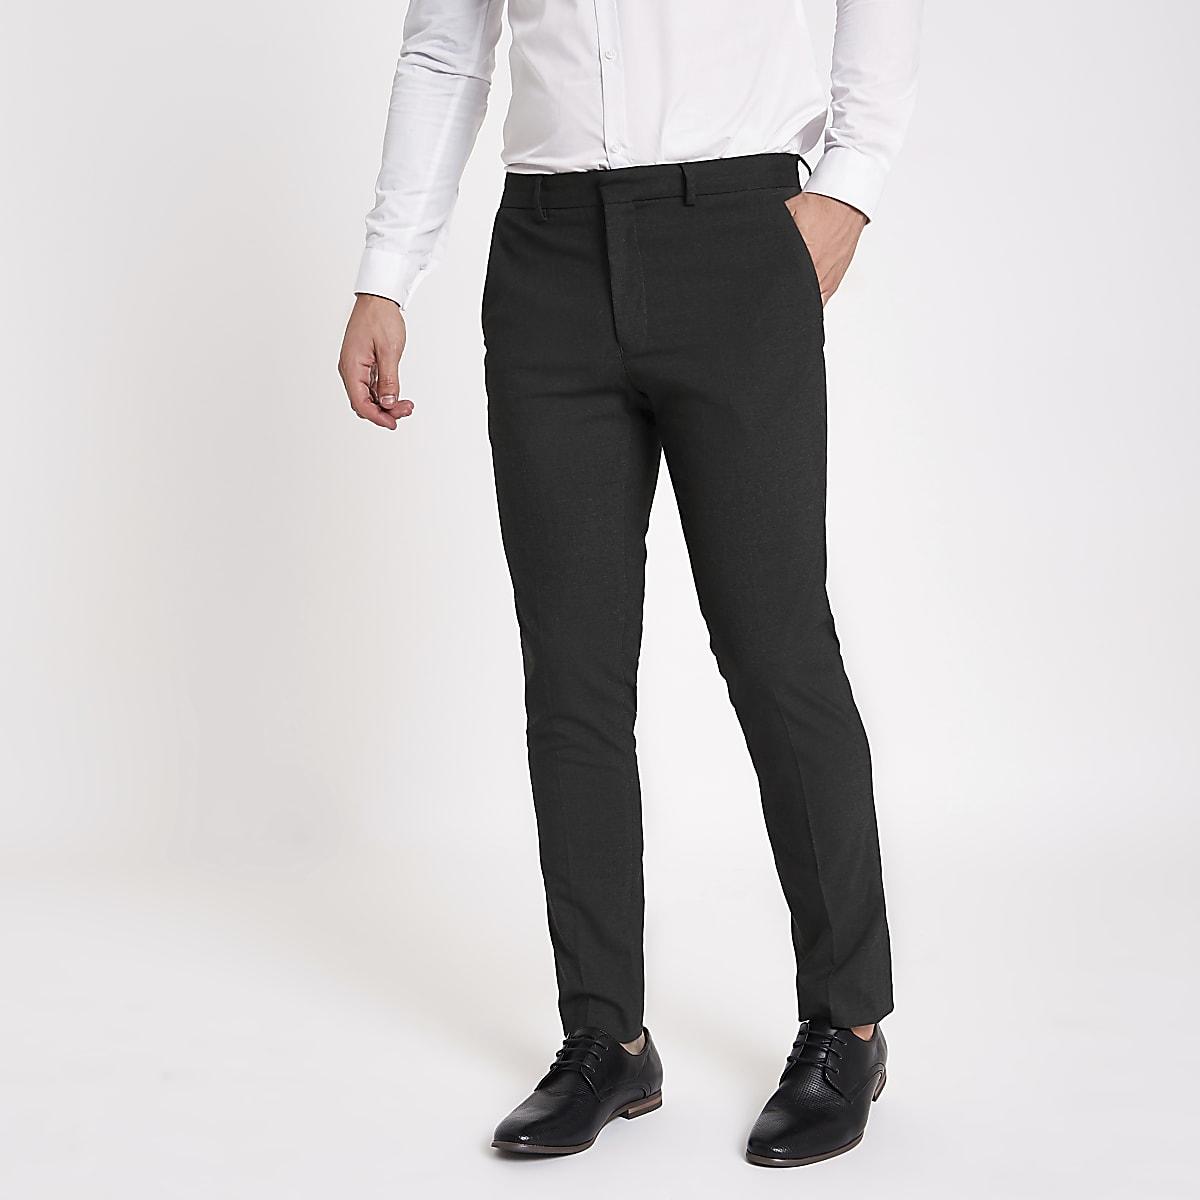 Grey skinny fit smart pants